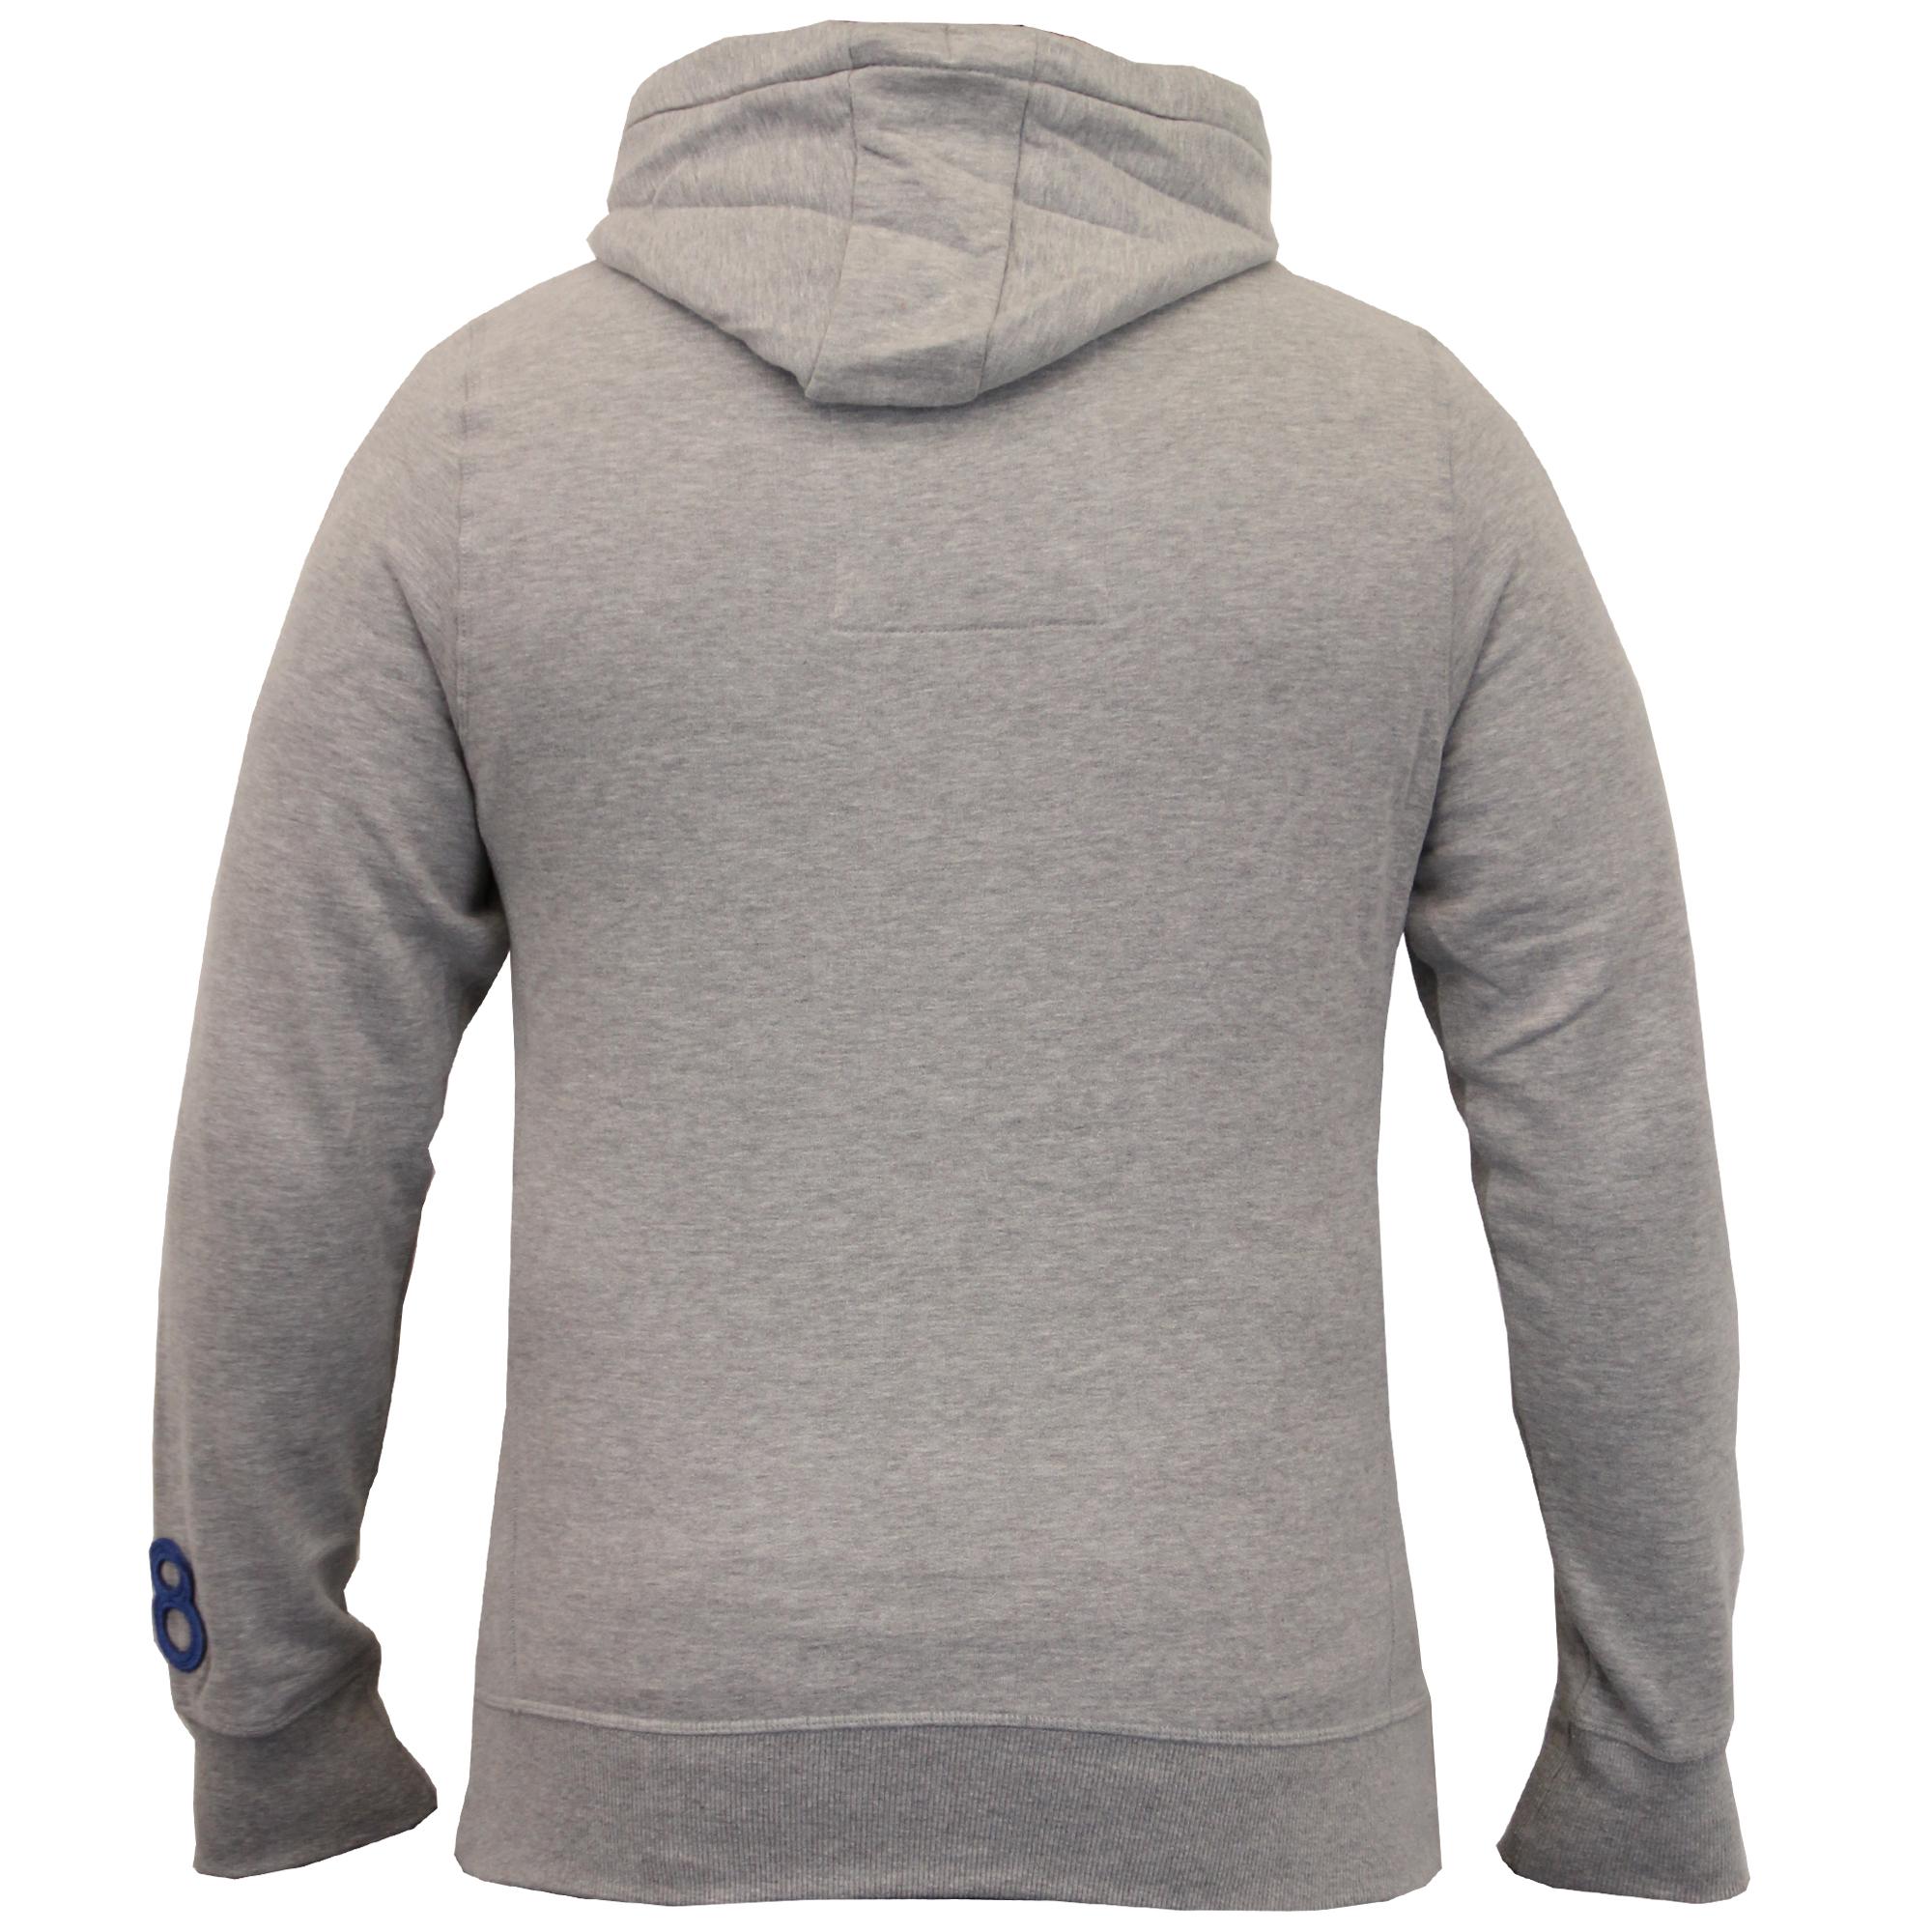 Mens-Sweatshirt-Tokyo-Laundry-Hooded-Top-Sweat-Applique-Zip-Gym-Fleece-Lined-New thumbnail 18